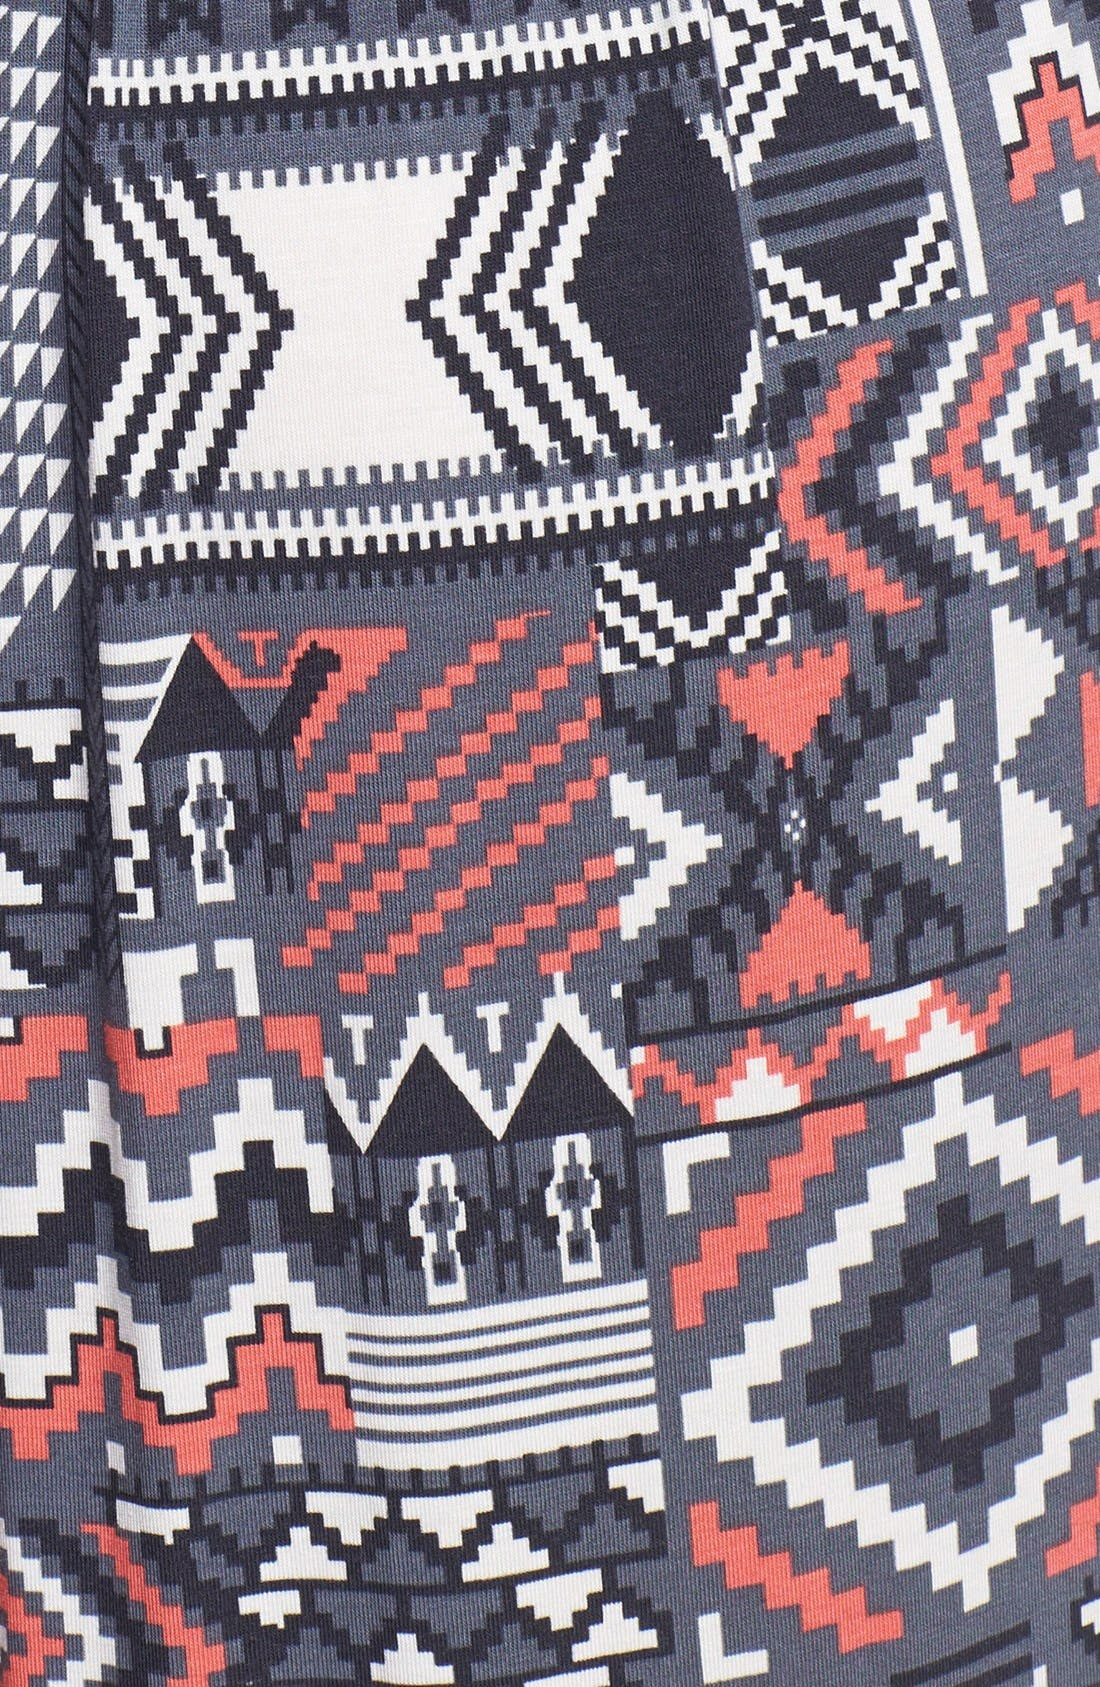 Alternate Image 3  - Felicity & Coco Printed Maxi Dress (Regular & Petite) (Nordstrom Exclusive)